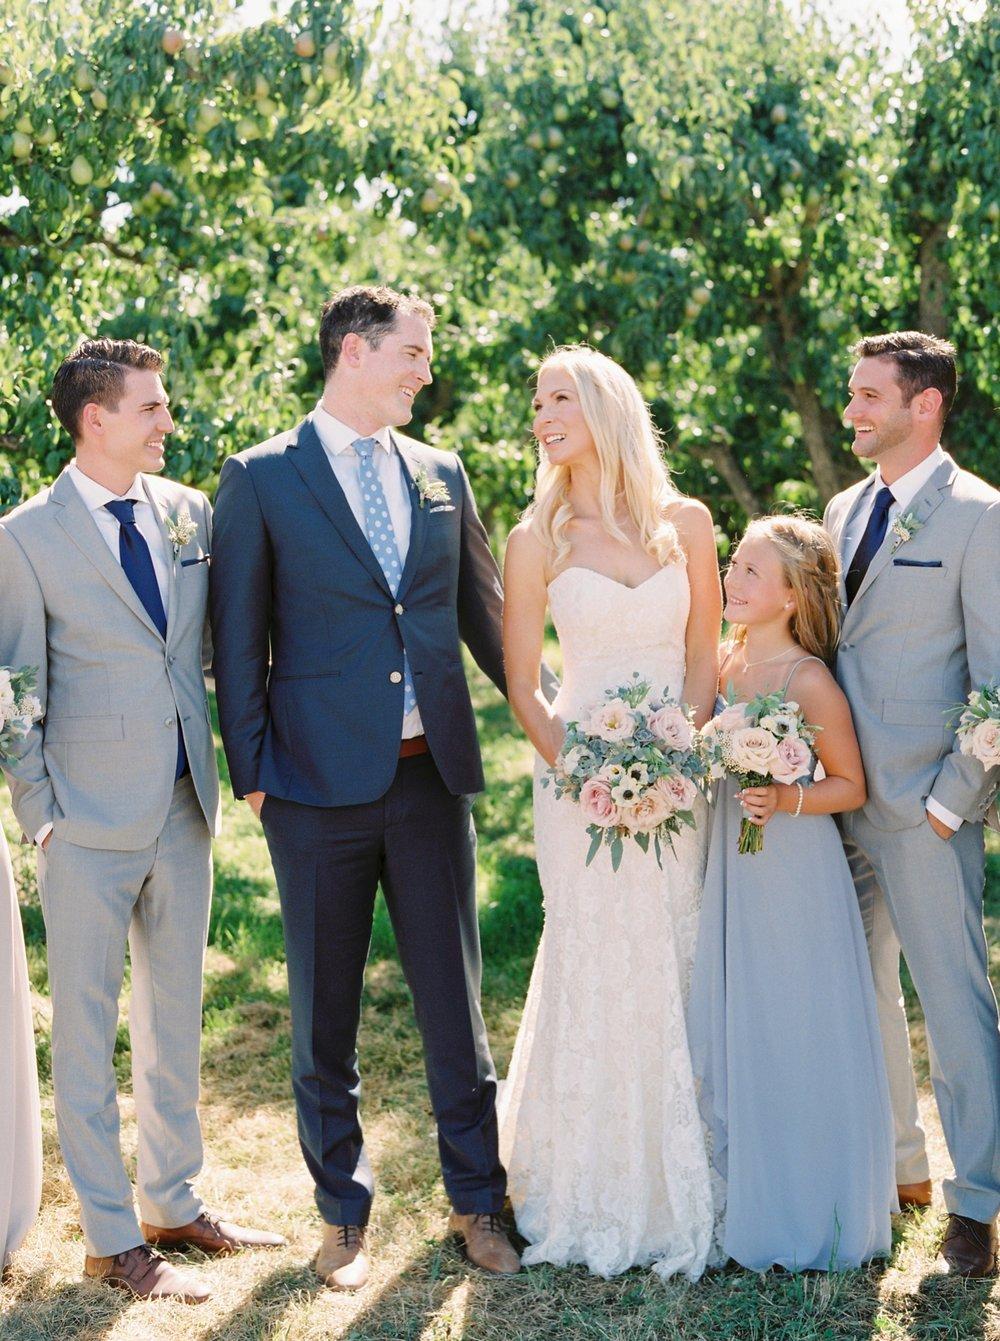 Kelowna wedding photographers | hotel eldorado wedding photographer | justine milton fine art film photography | bride and groom | bride and groom portraits | wedding portrait